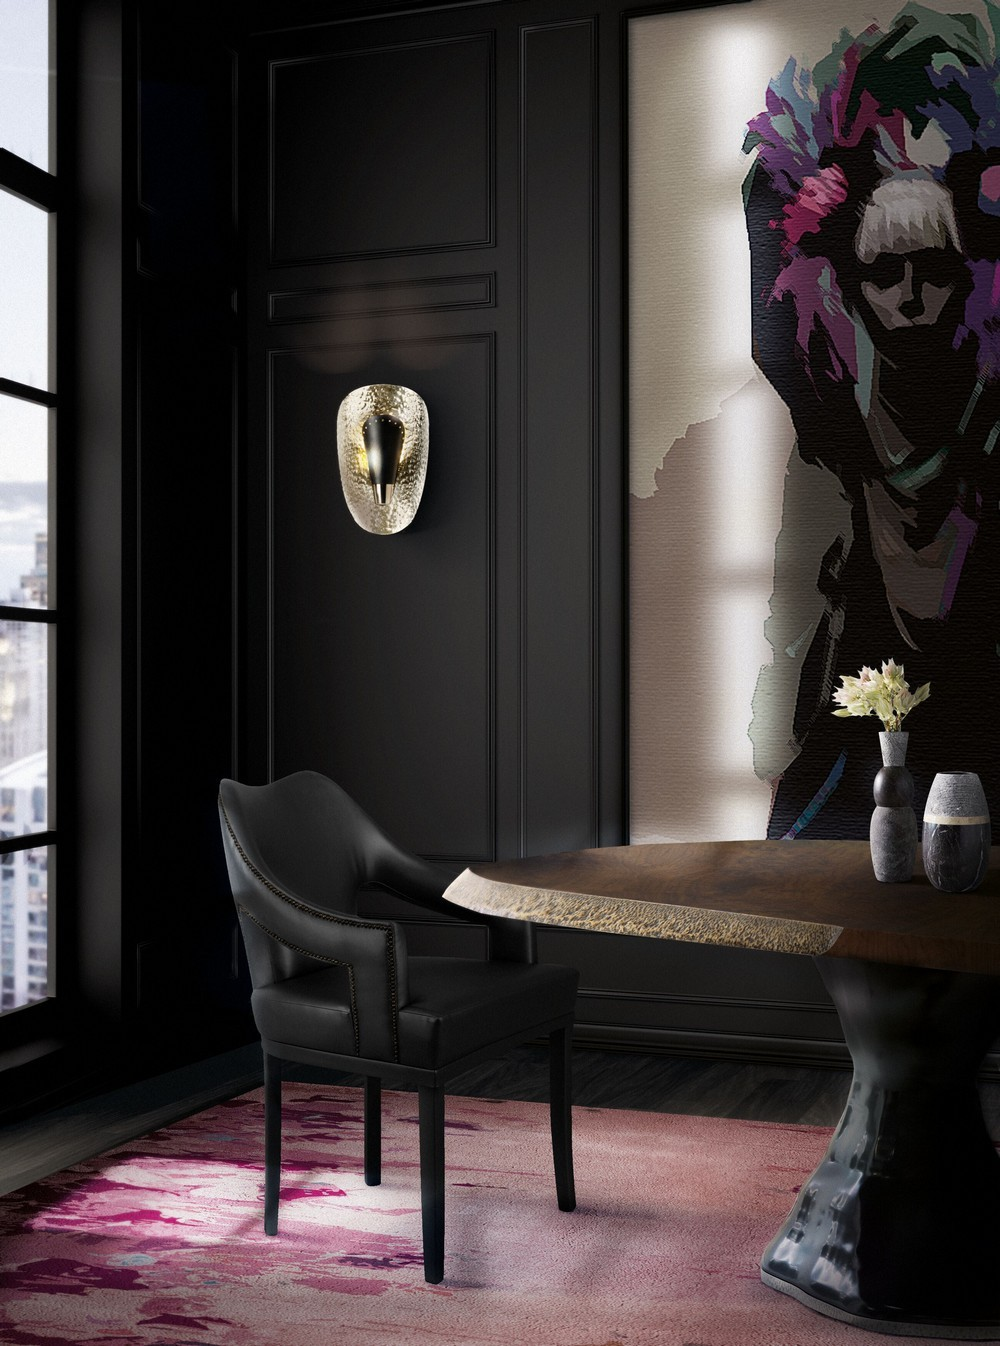 The Perfect Element For Stylish Settings: 25 Dining Tables You'll Love dining tables The Perfect Element For Stylish Settings: 25 Dining Tables You'll Love f D0R5YA